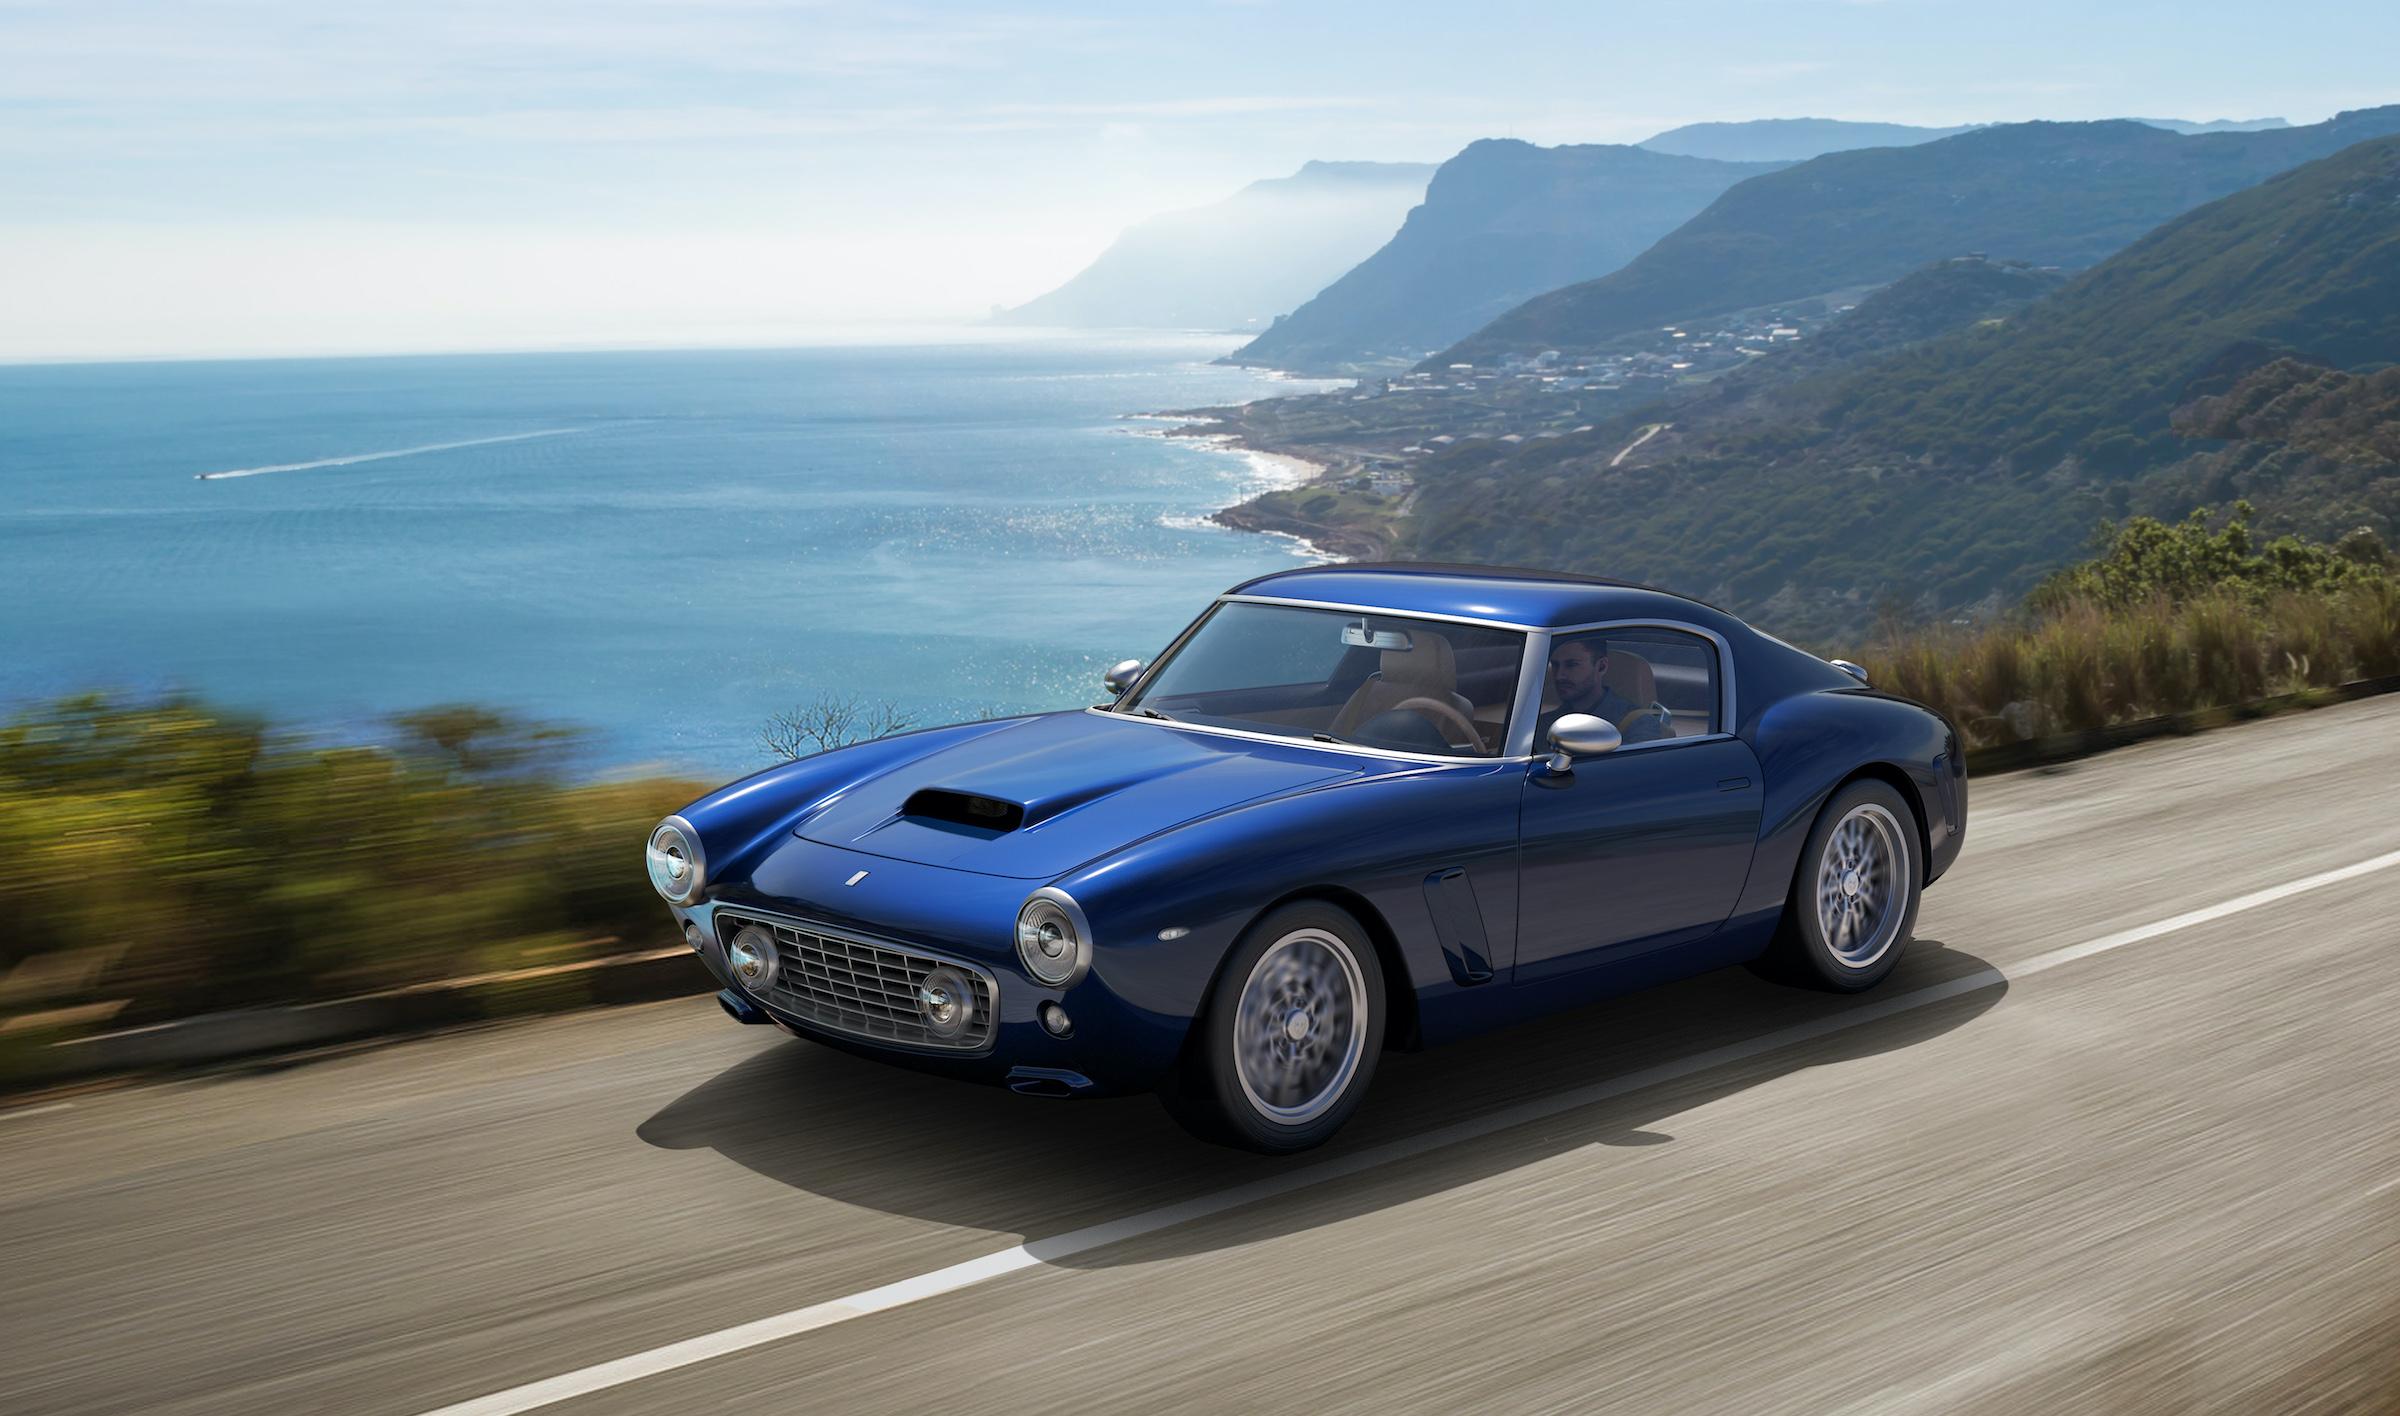 Touring car champions RML reveal new Ferrari 250 GT SWB recreation